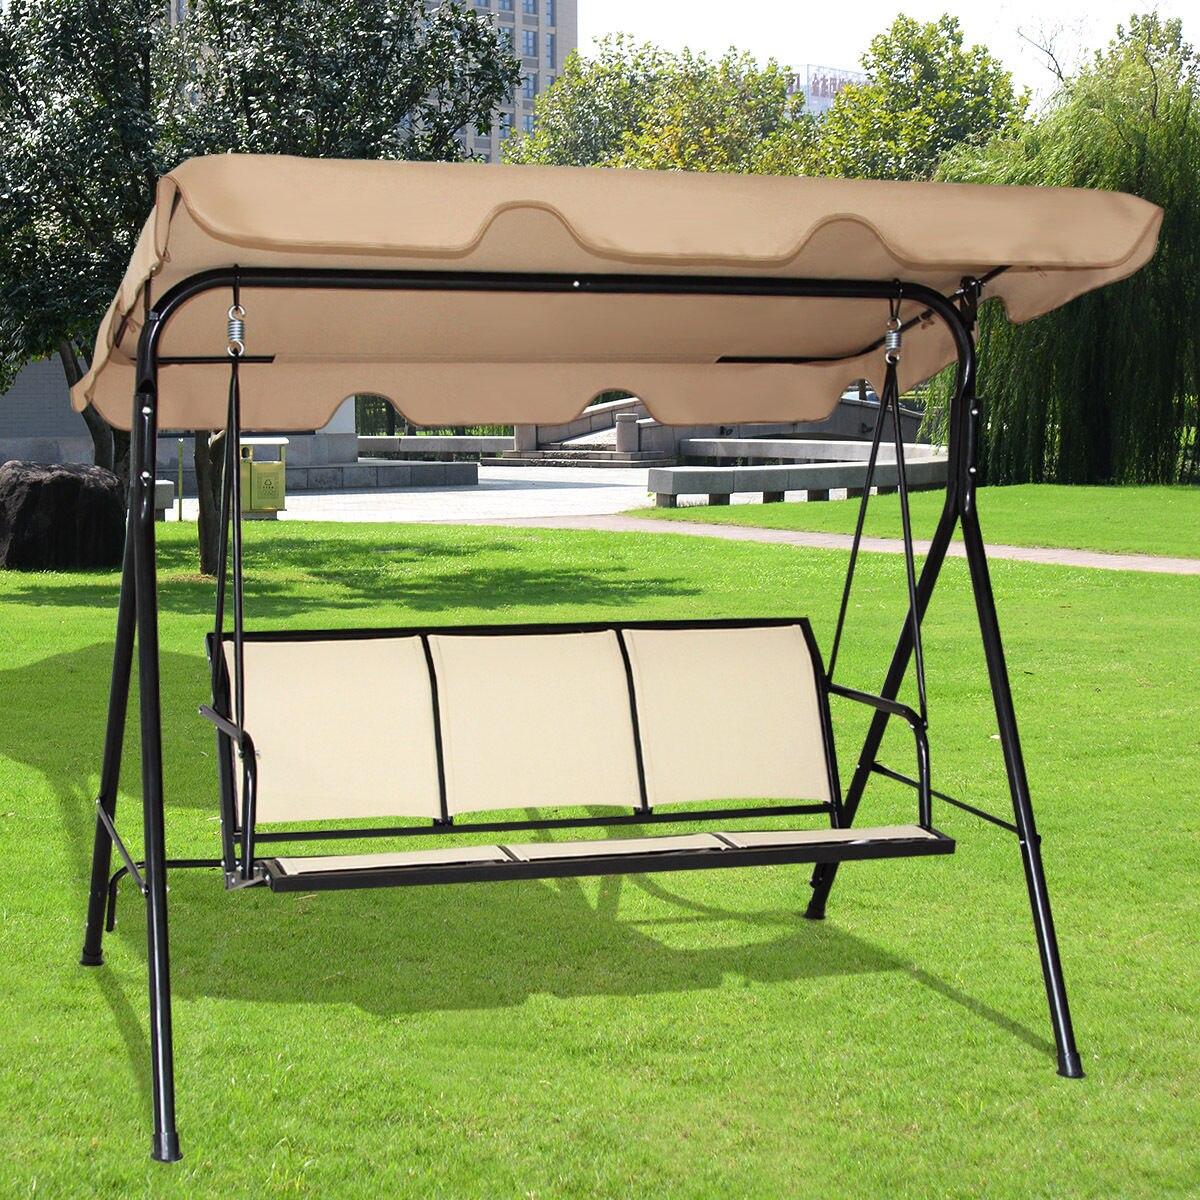 Costway 3 Person Outdoor Patio Swing Canopy Awning Yard Furniture Hammock Steel Beige